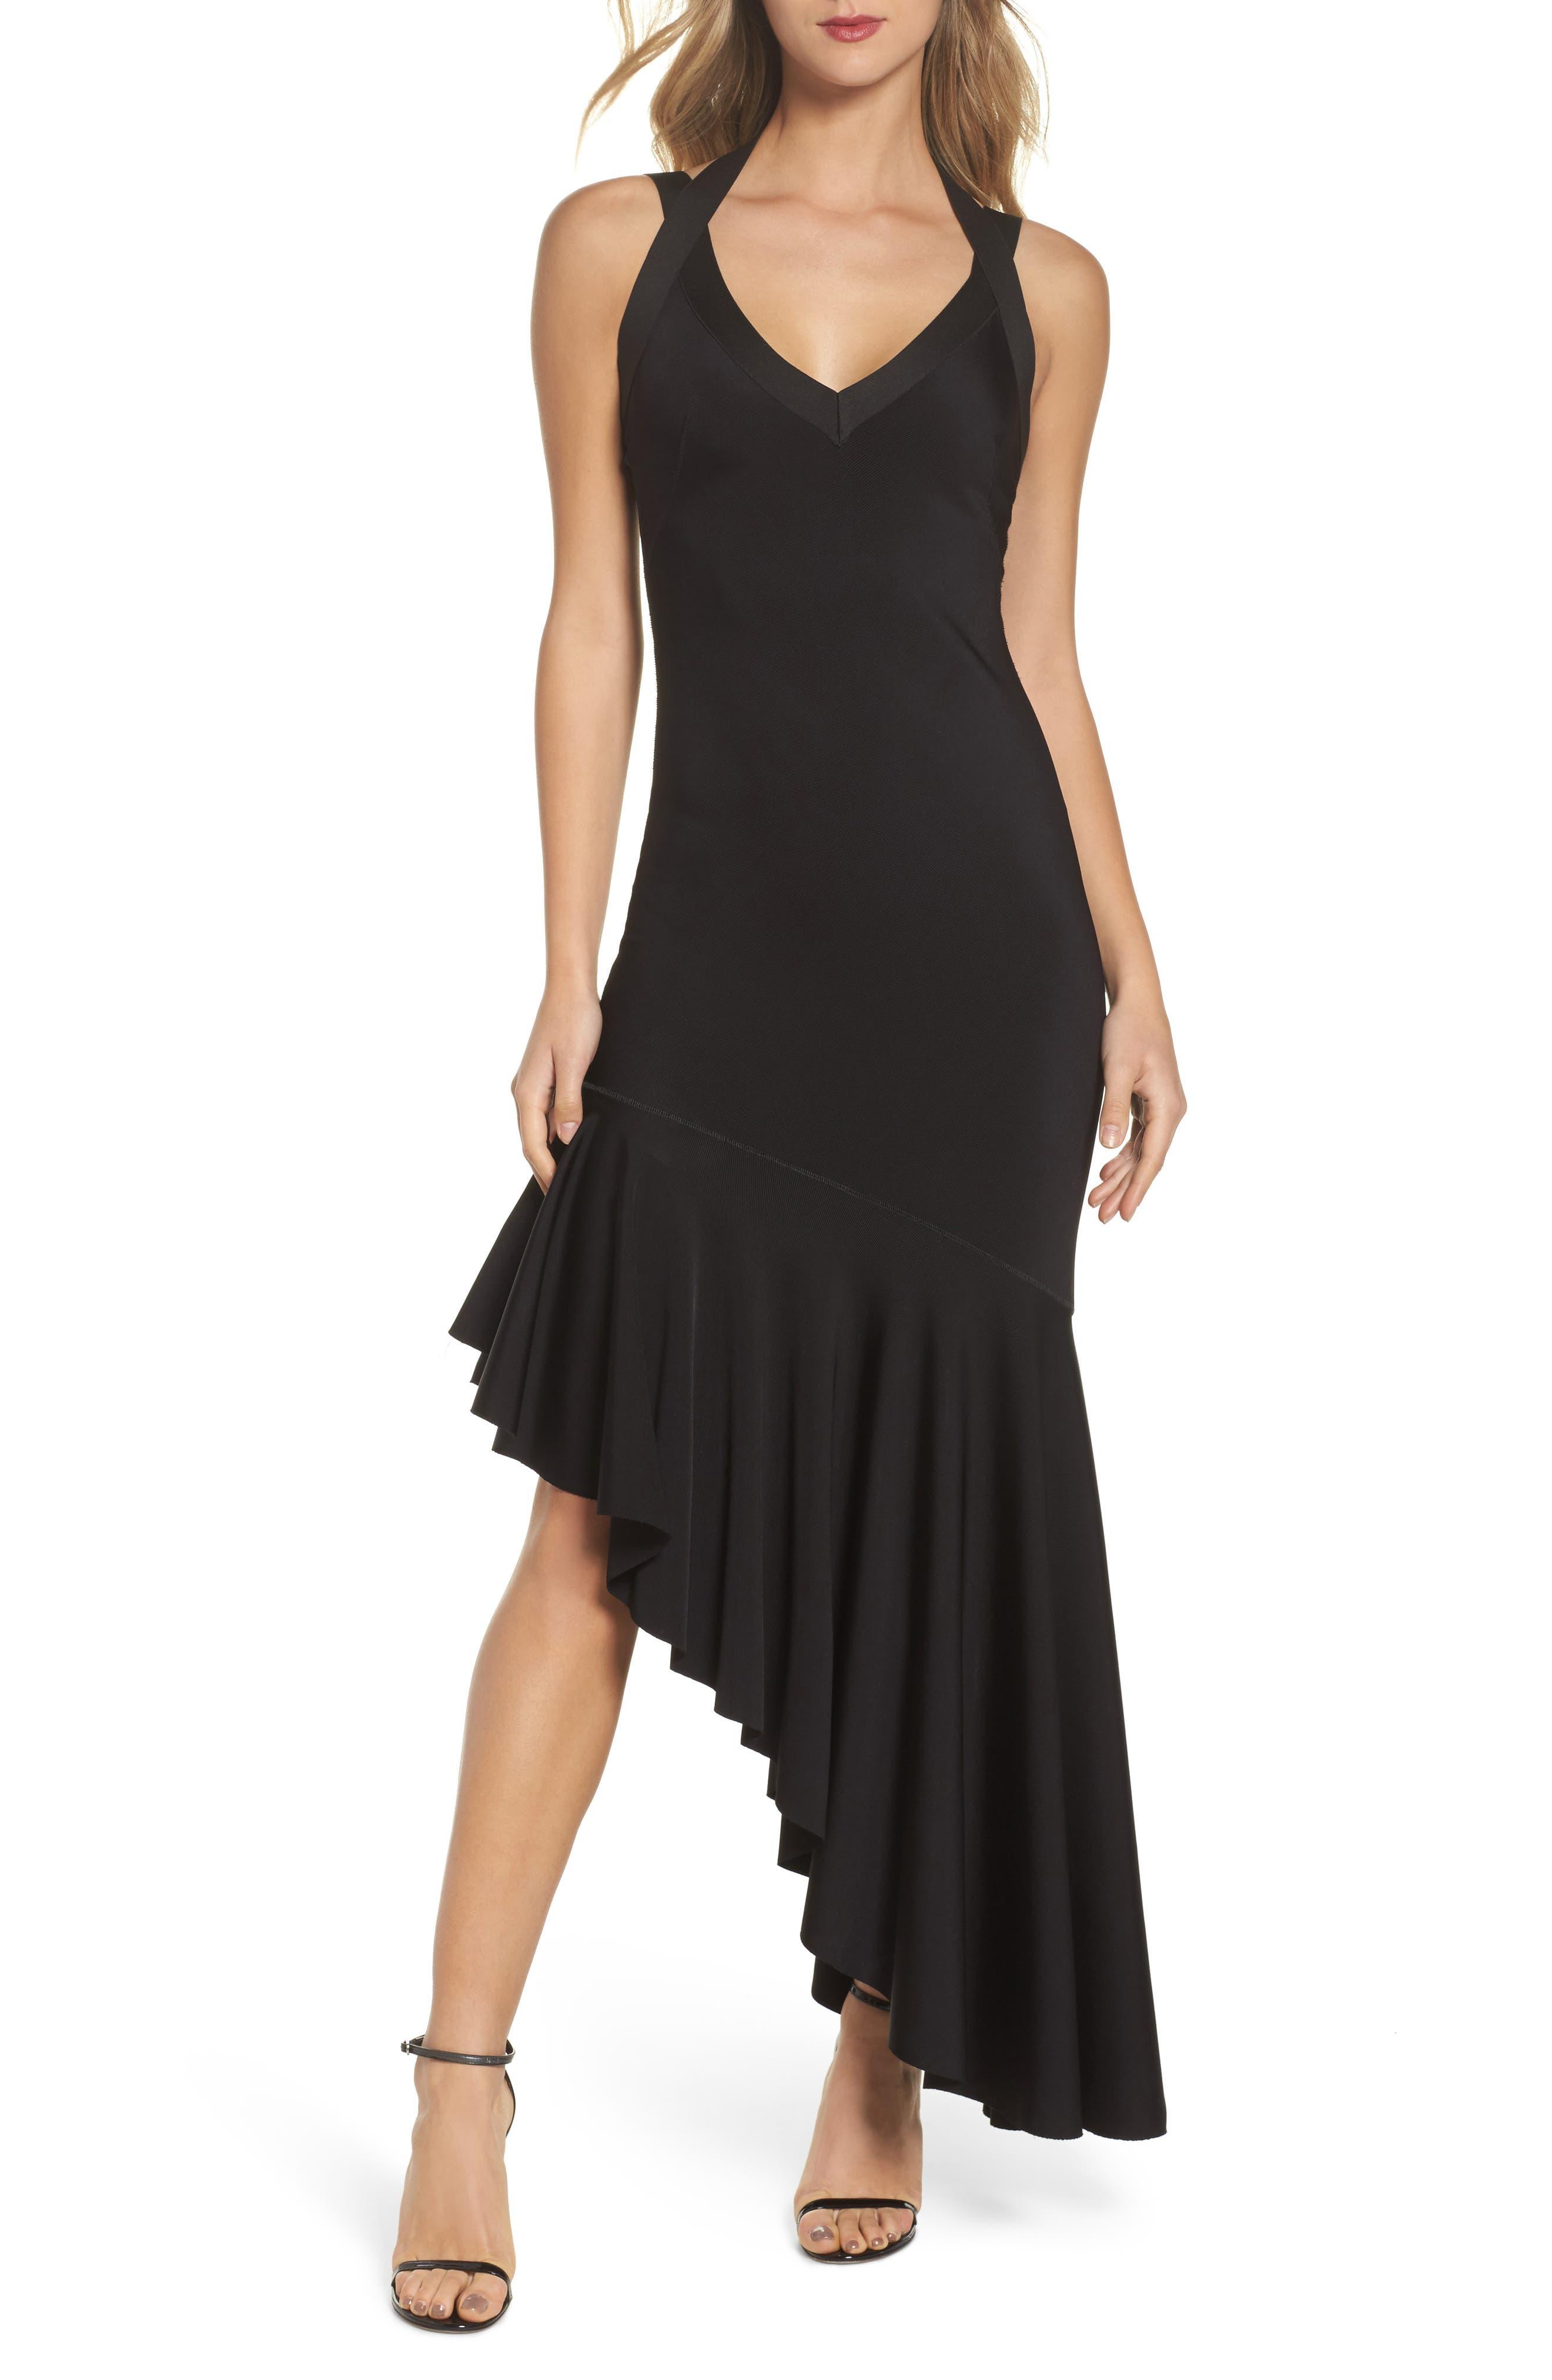 Alternate Image 1 Selected - Maria Bianca Nero Tara High/Low Knit Dress